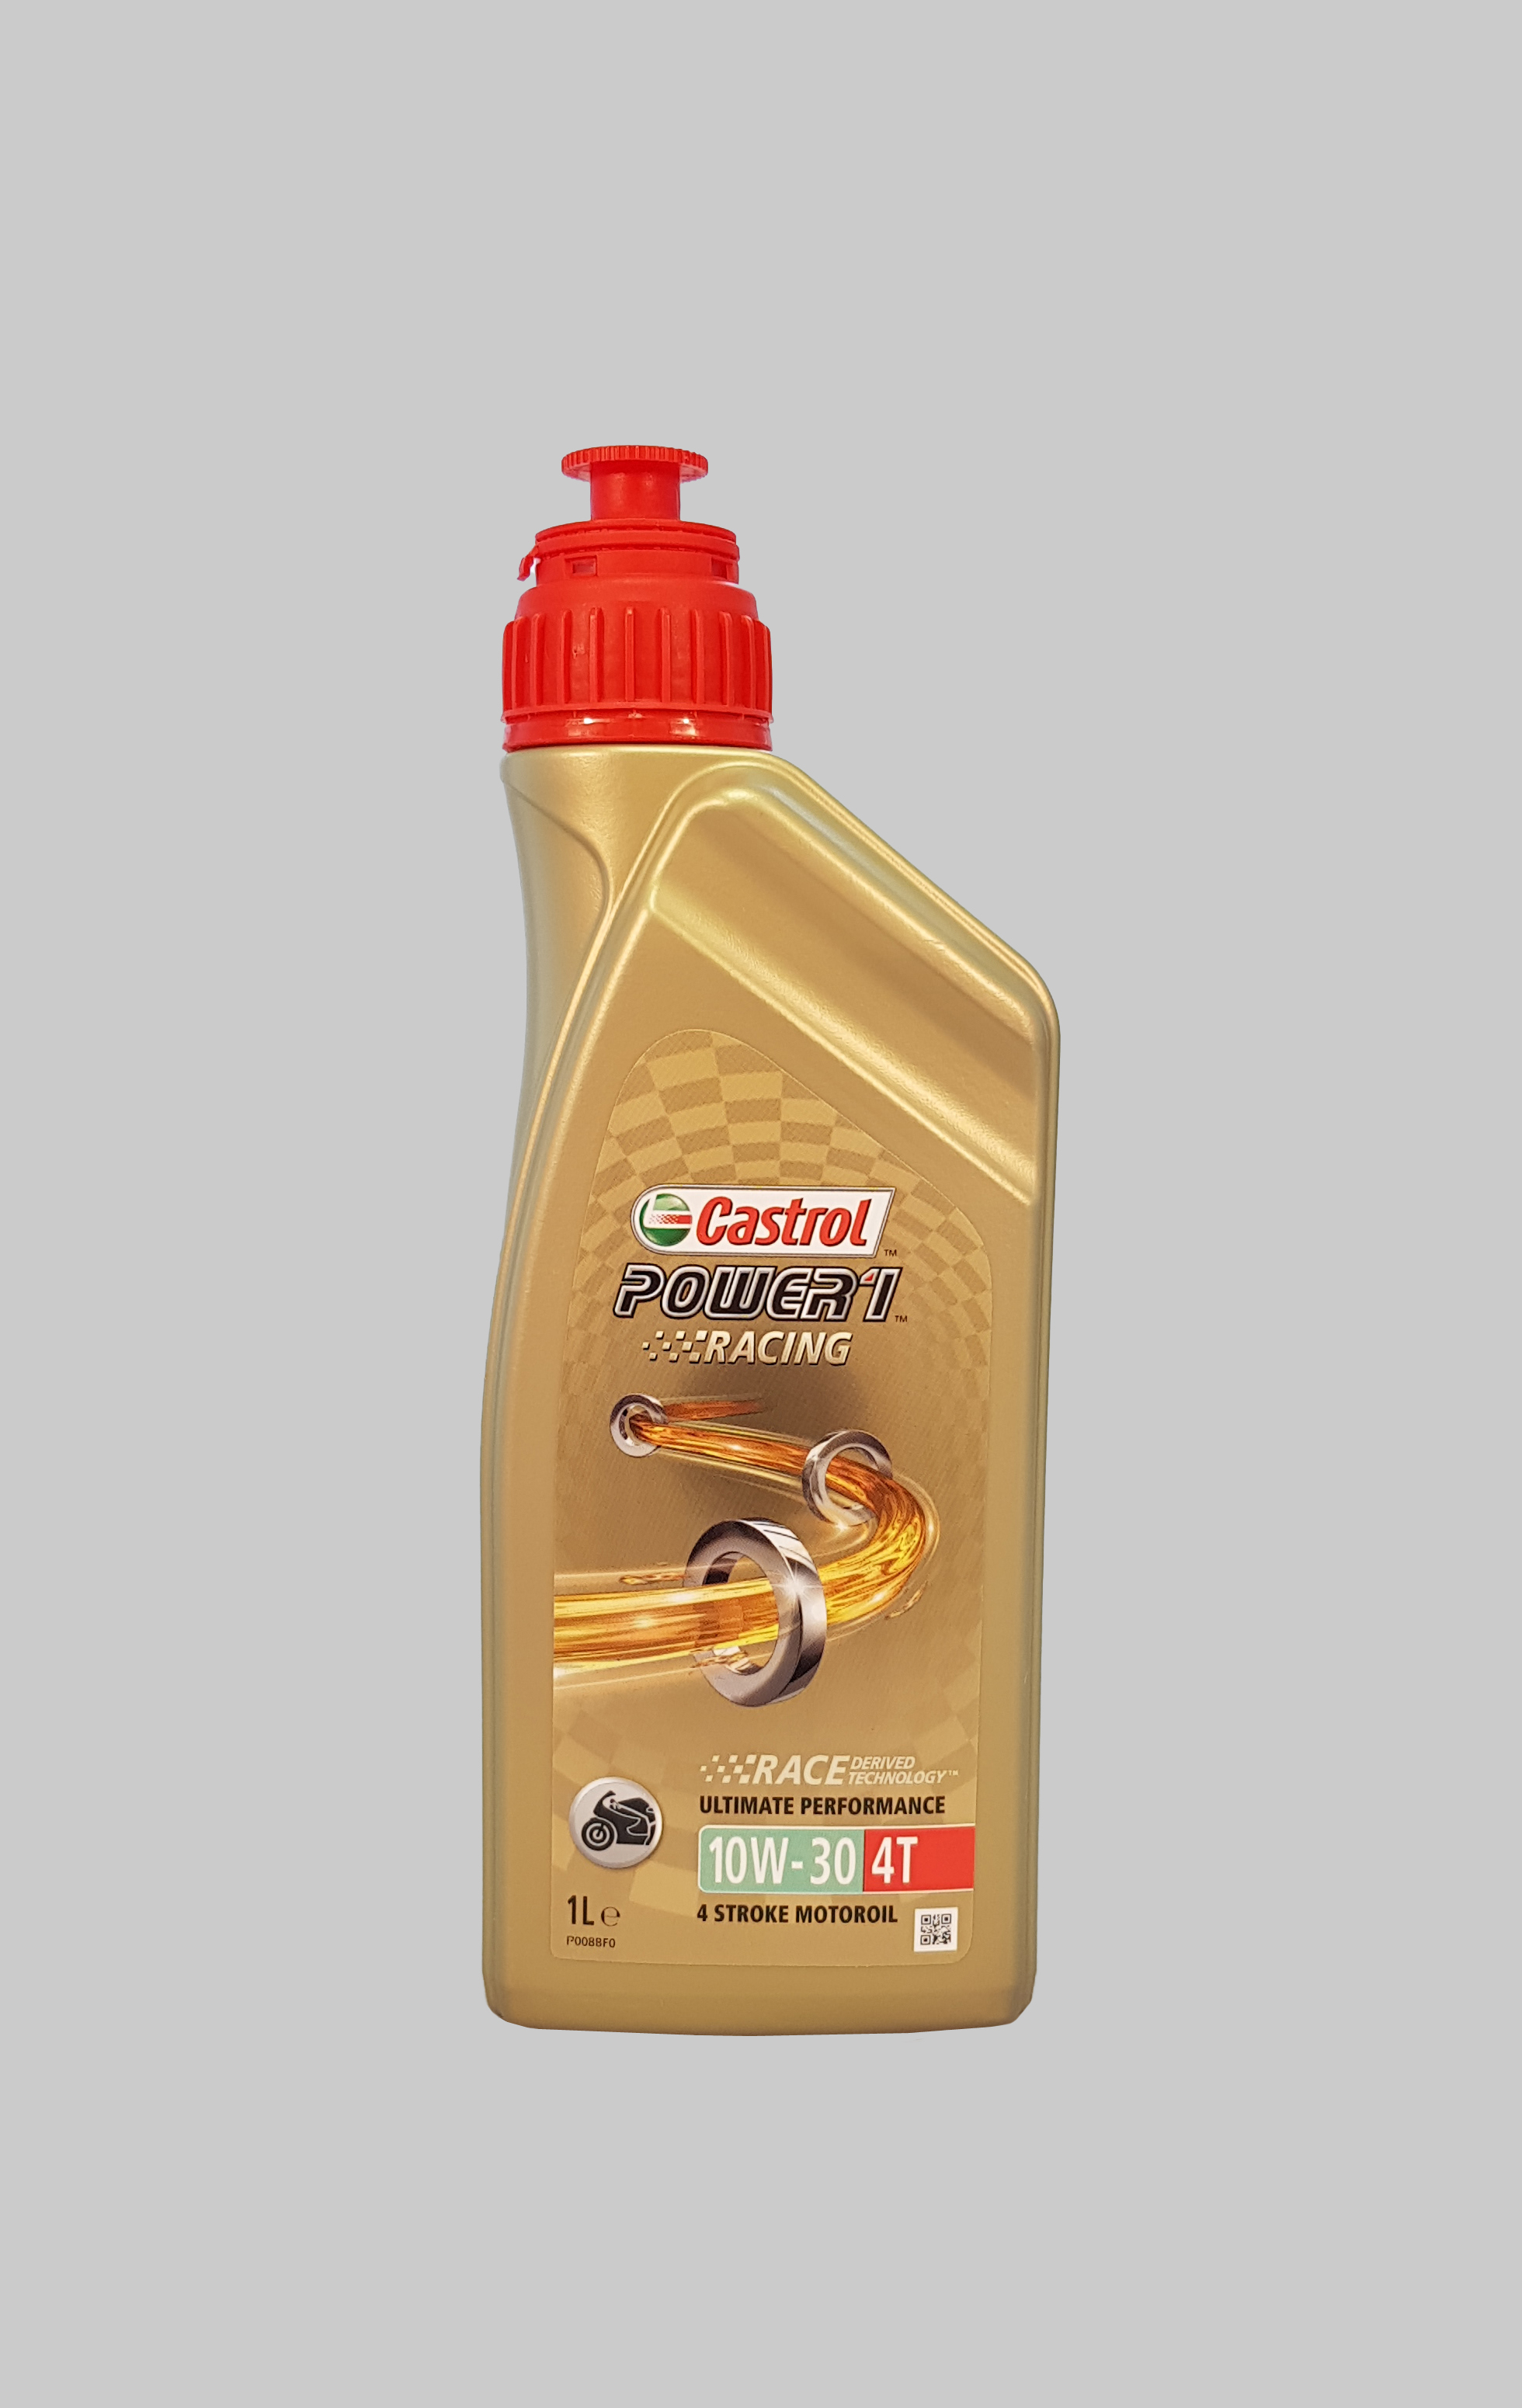 Castrol Power 1 Racing 4T 10W-30 1 Liter